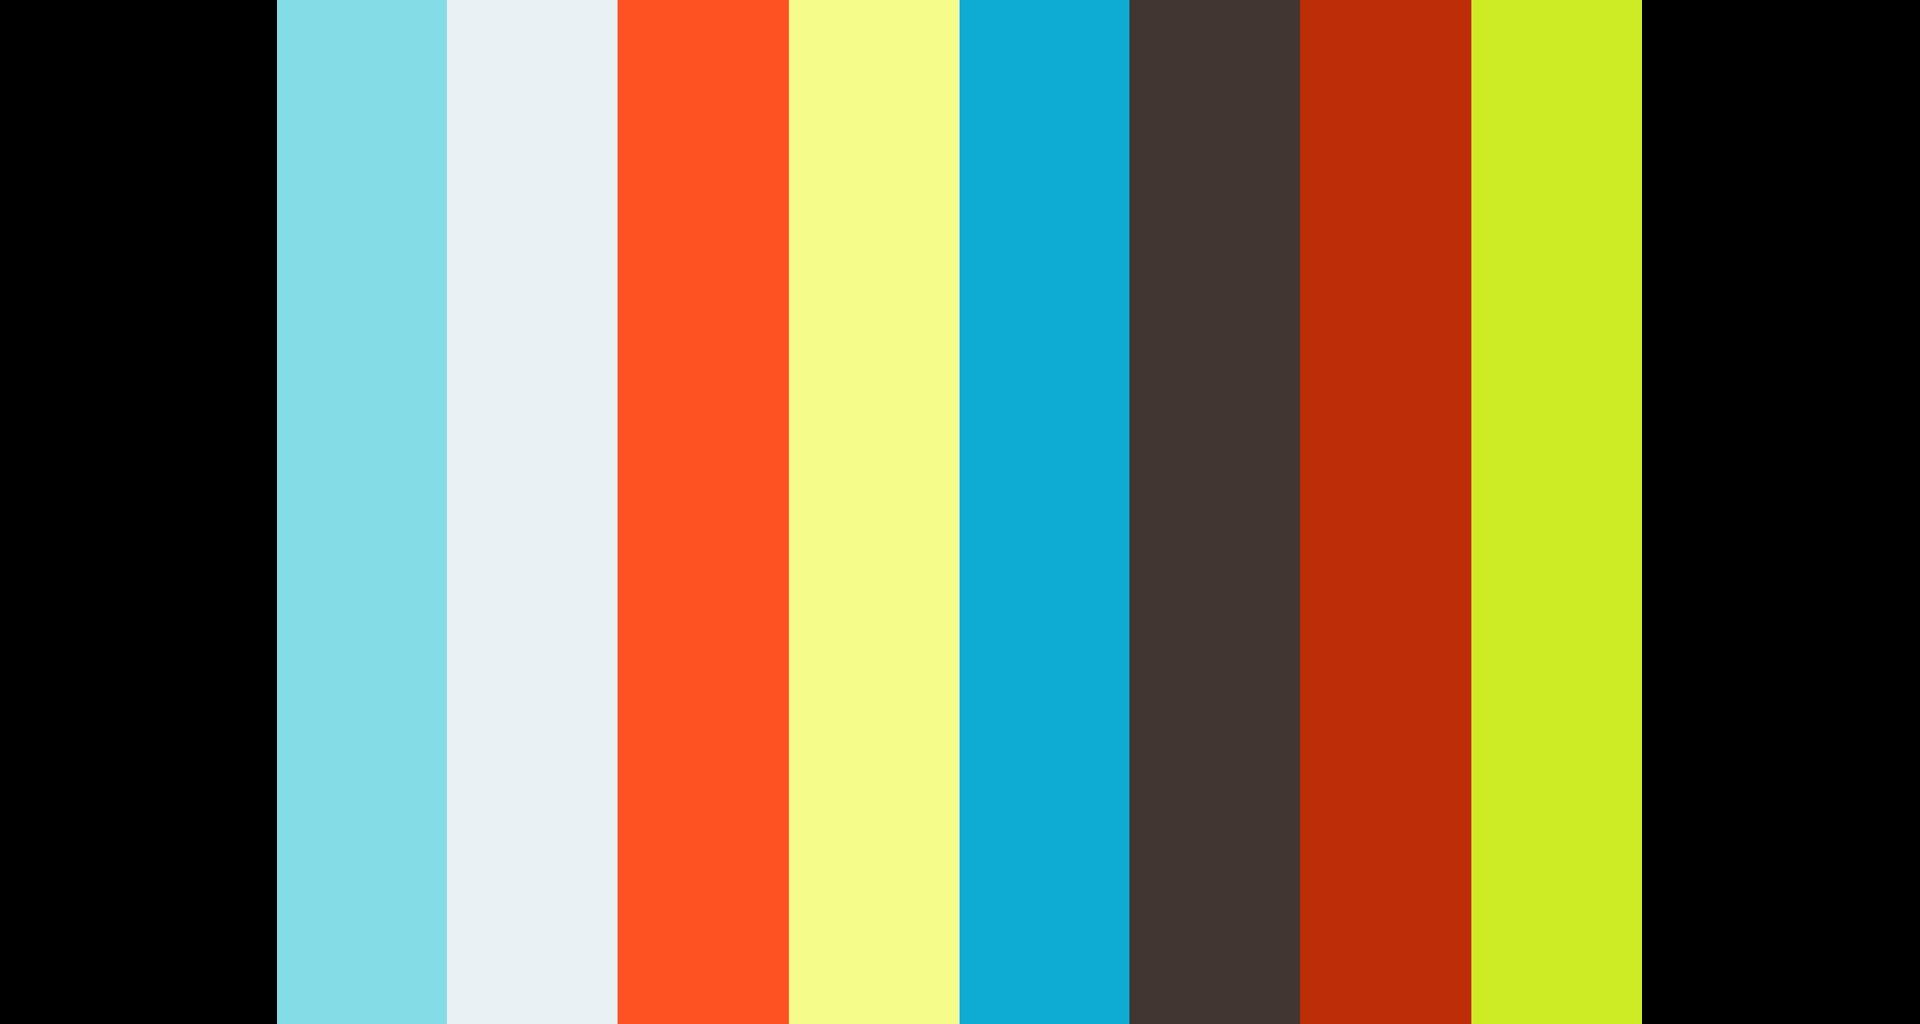 Mastercam 2018 Library - Face / Radial Polar Milling Settings